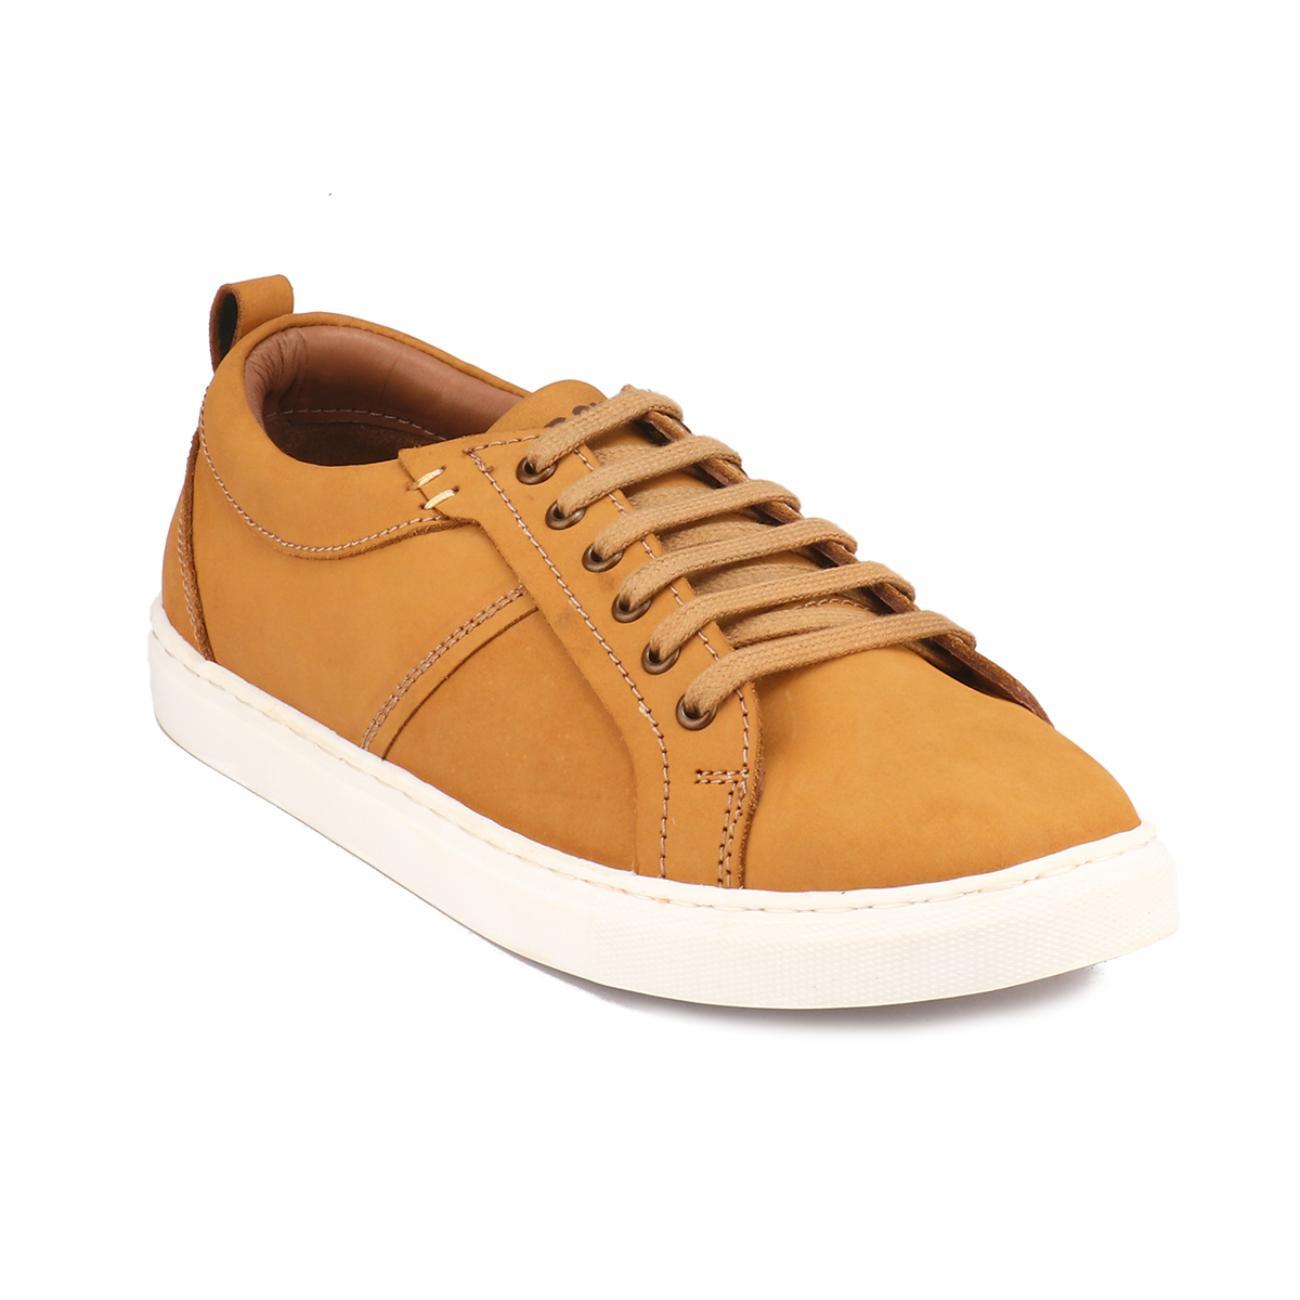 rust casual sneakers online